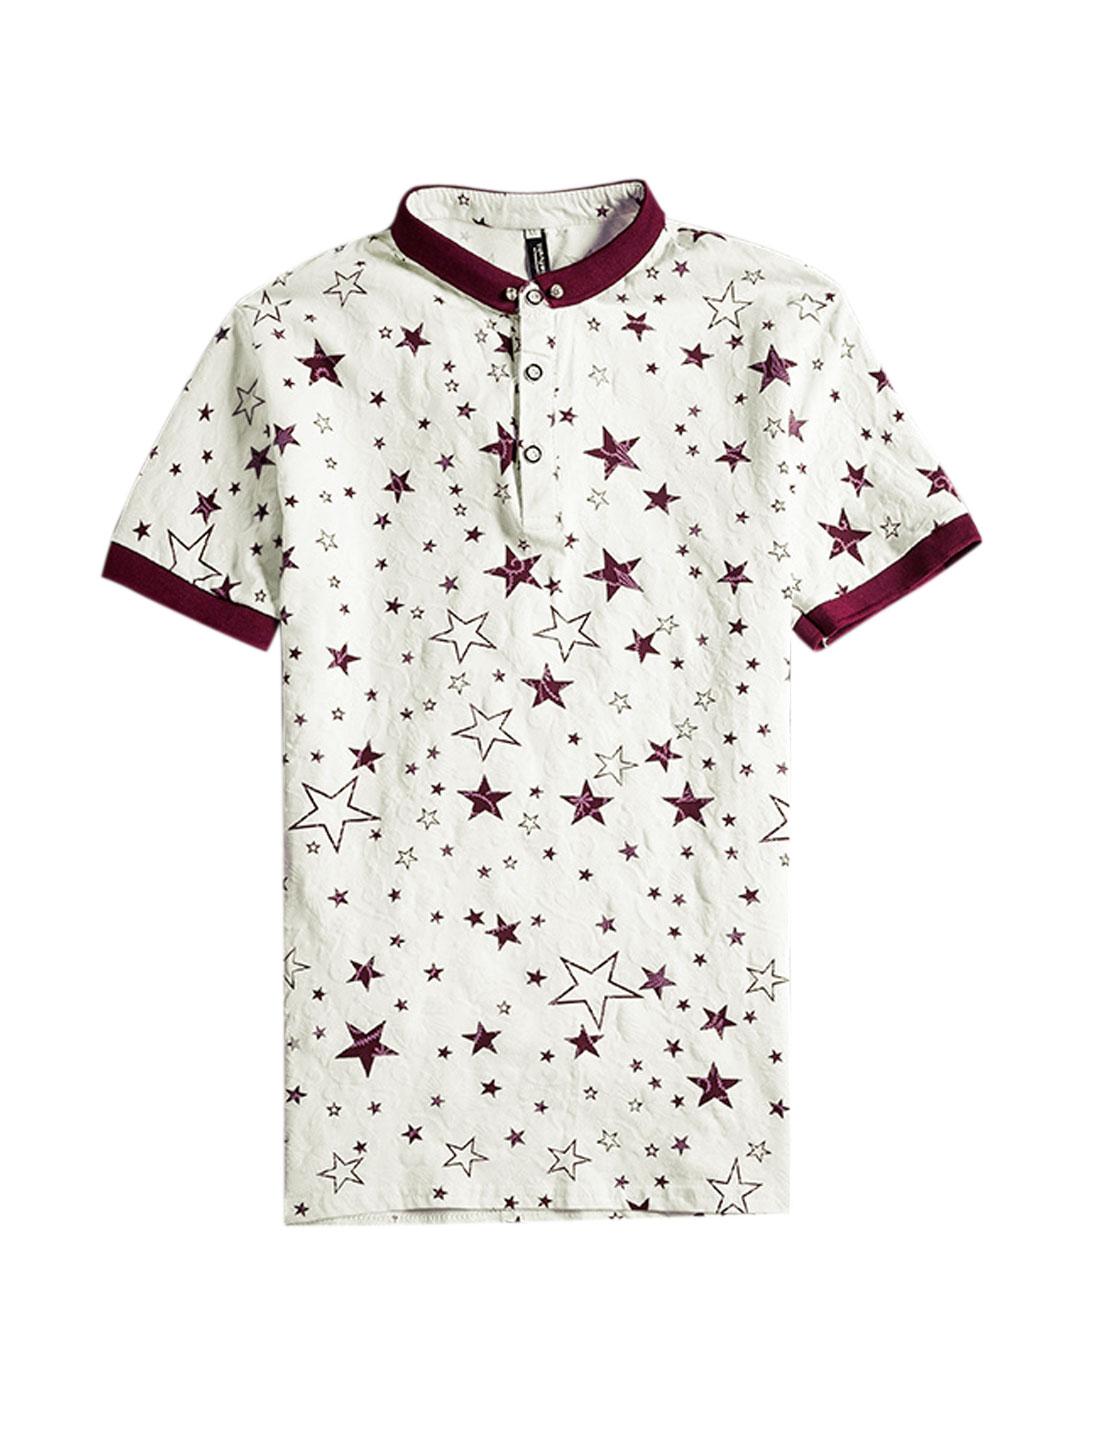 Man Short Sleeves Stars Prints Polo Shirts Burgundy White S